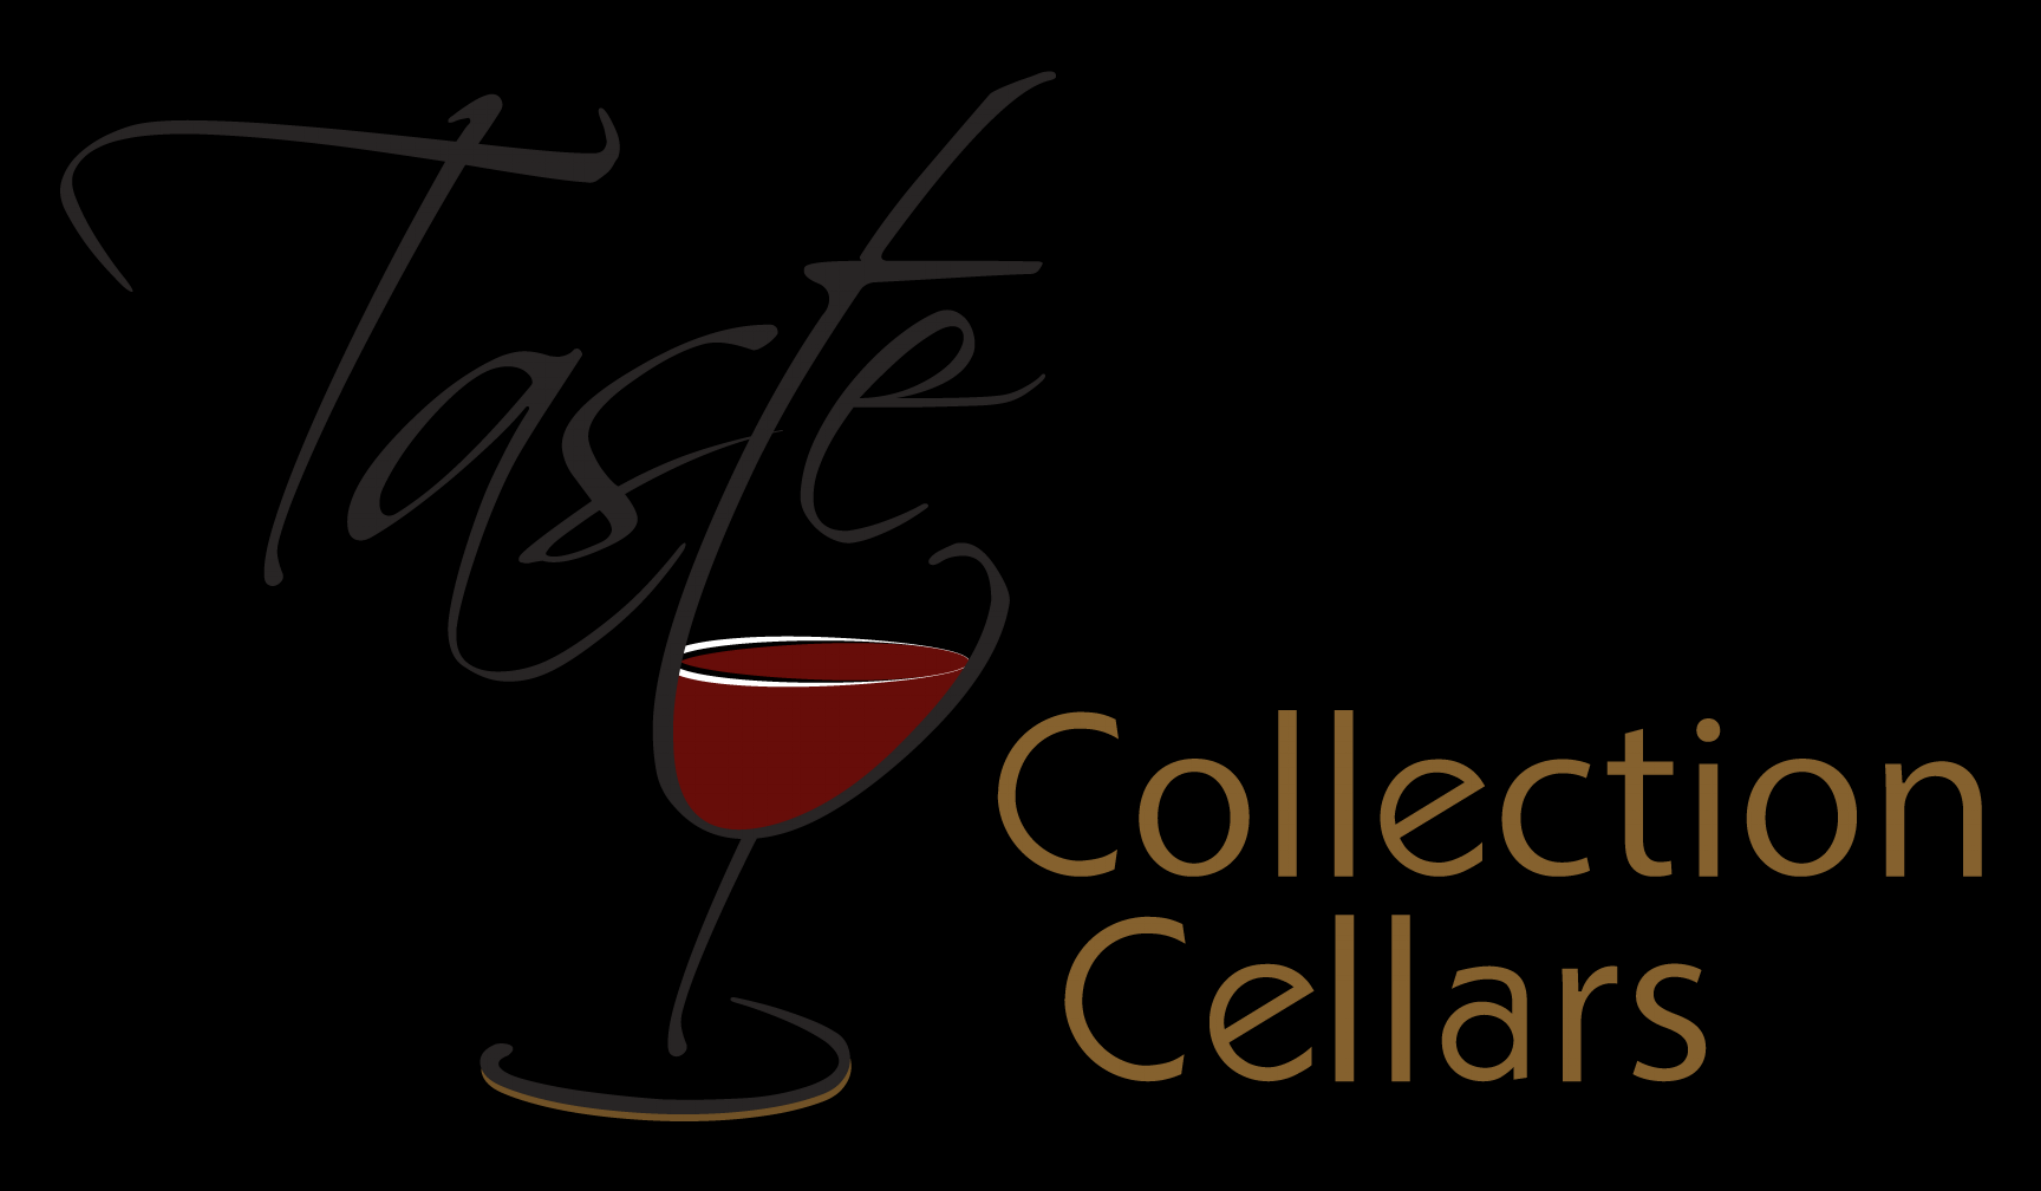 Chef Rhonda Collection Cellars Logo Large.png